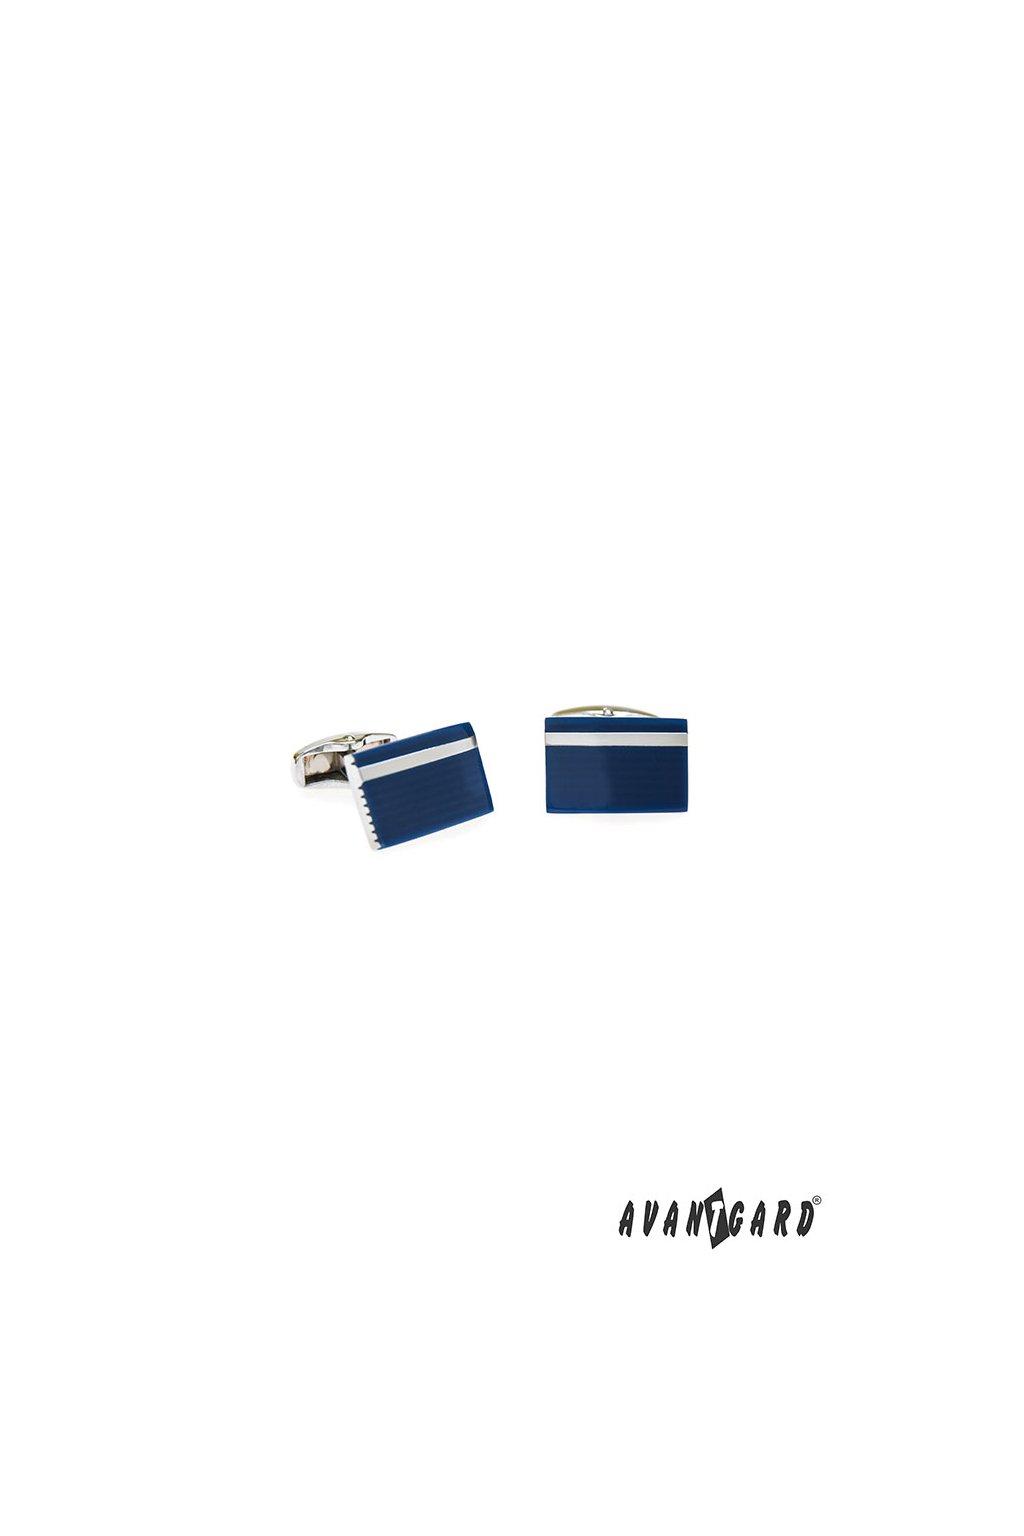 Manžetové knoflíčky PREMIUM, 573-20683, Stříbrná lesk/modrá